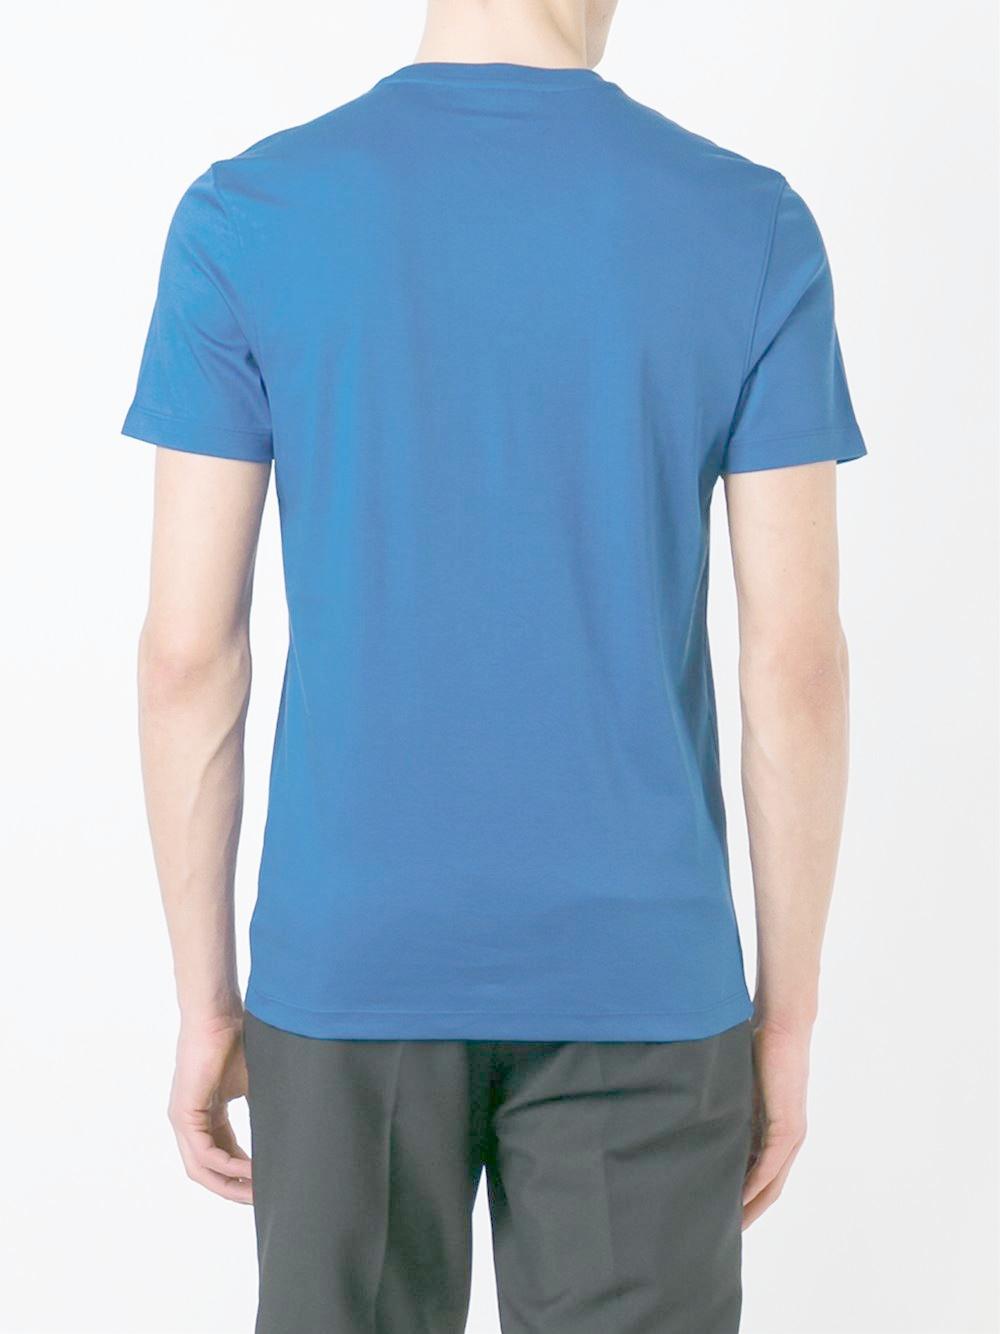 michael kors classic t shirt in blue for men lyst. Black Bedroom Furniture Sets. Home Design Ideas